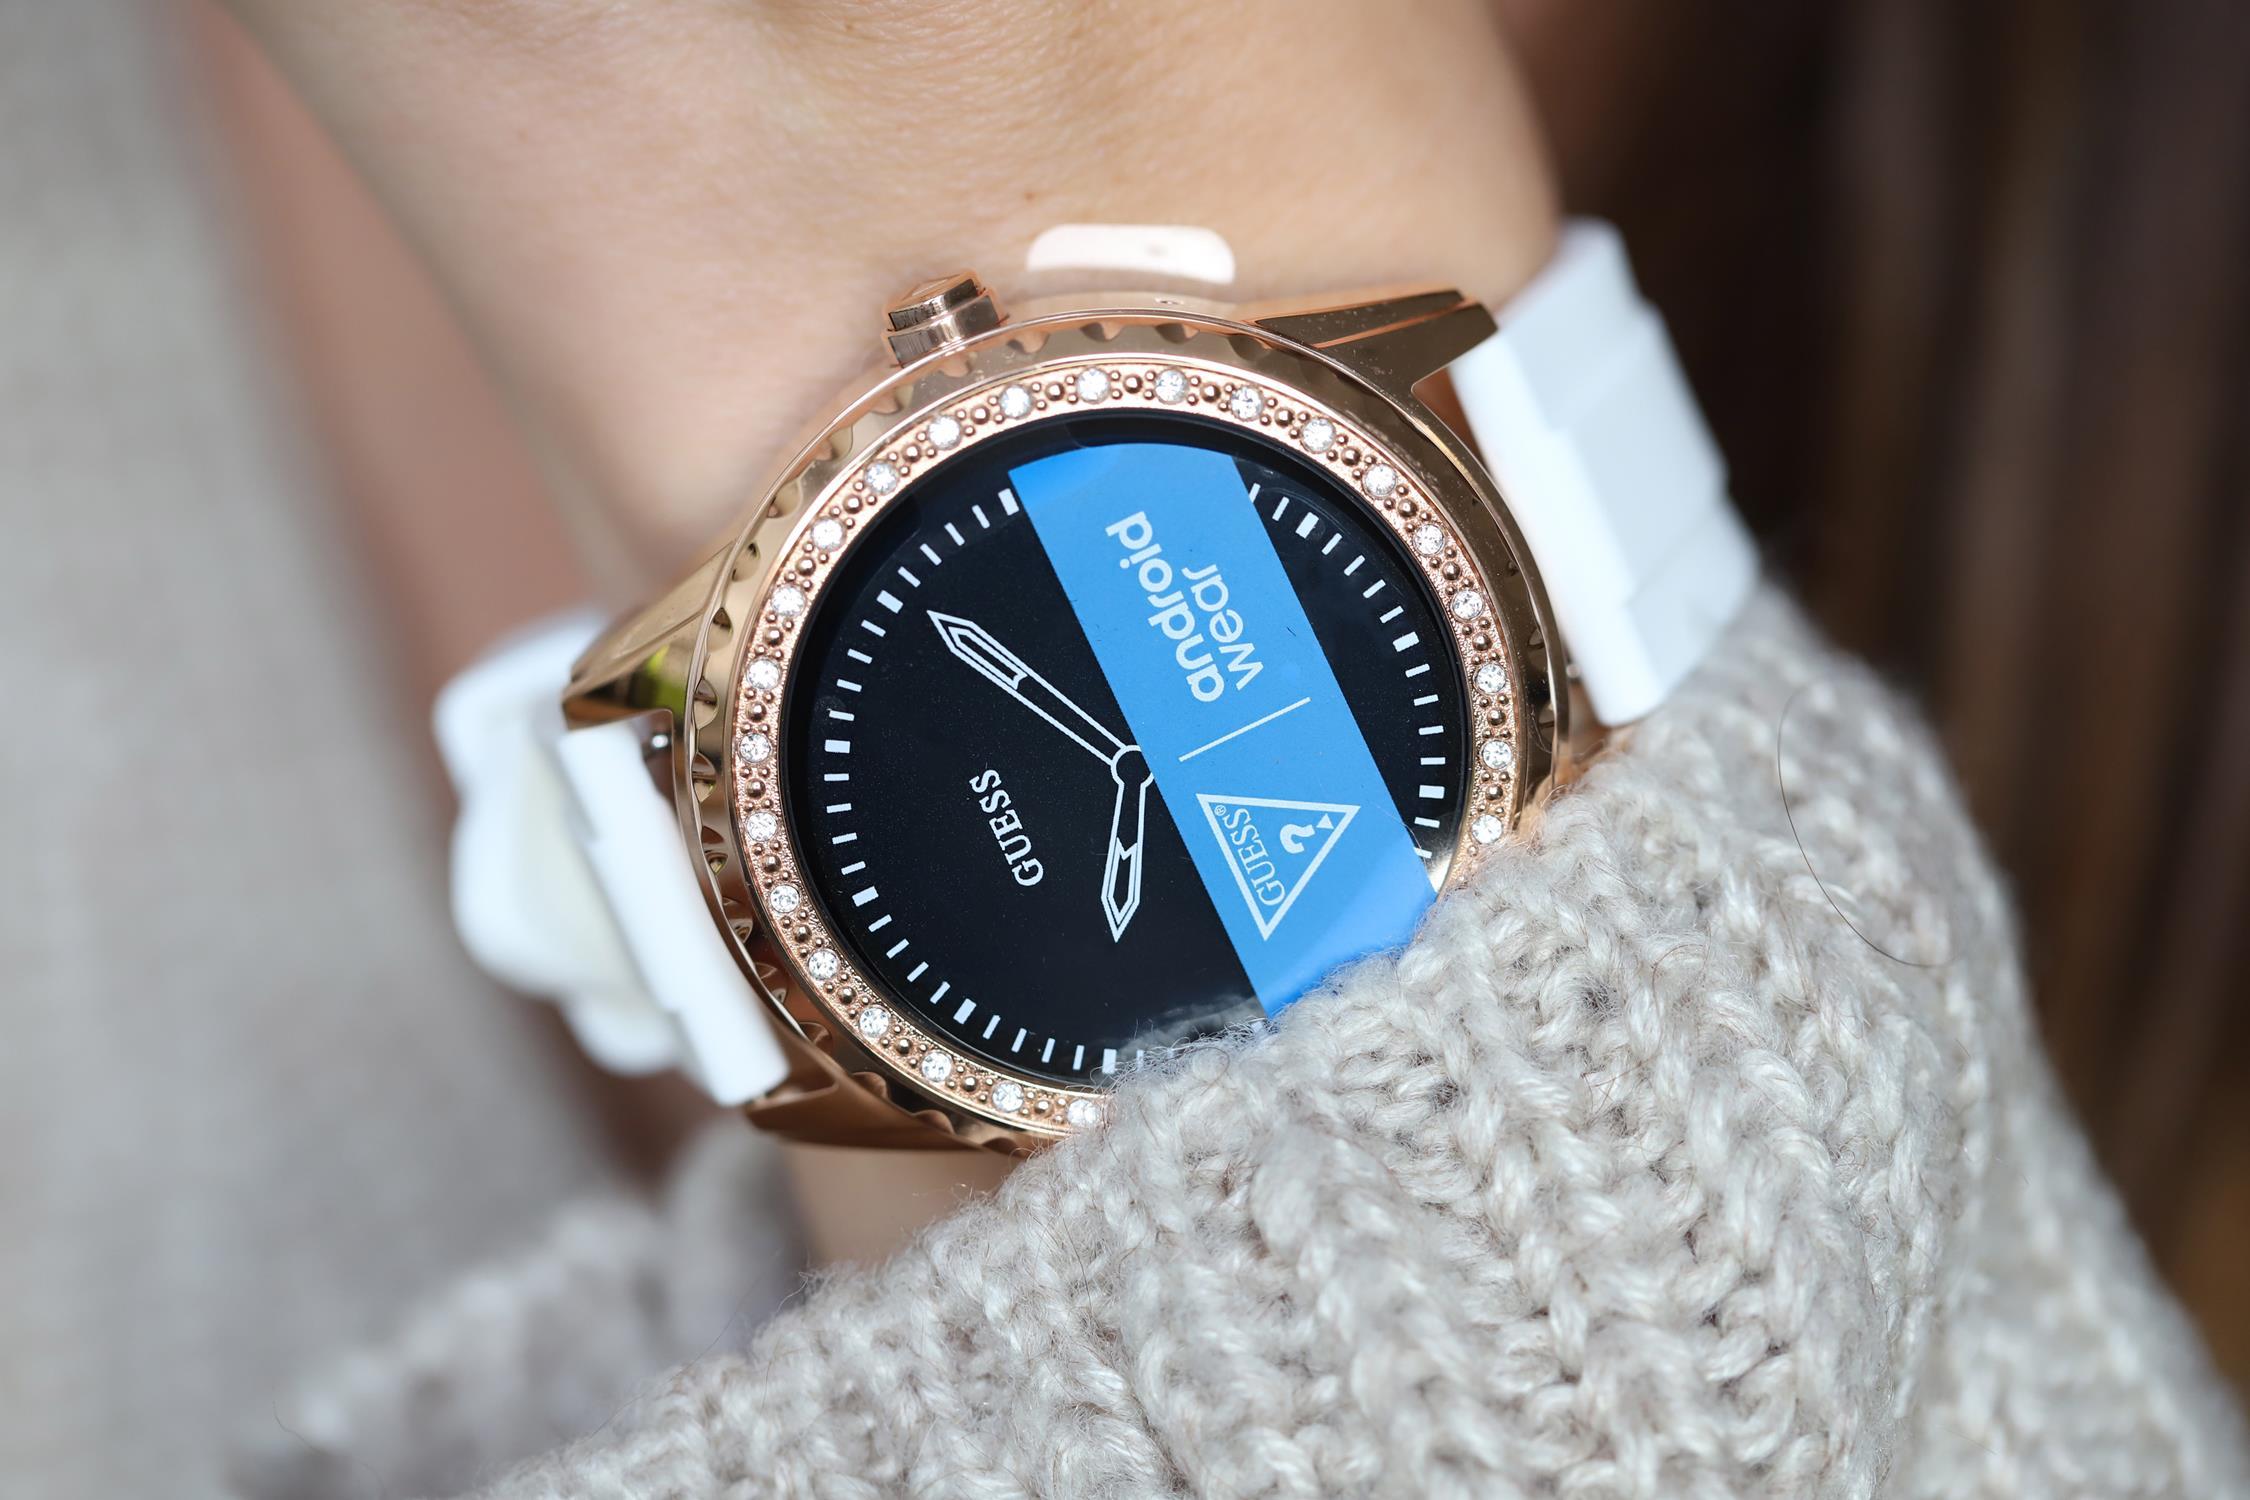 Zegarki Guess i akcesoria   E Watches